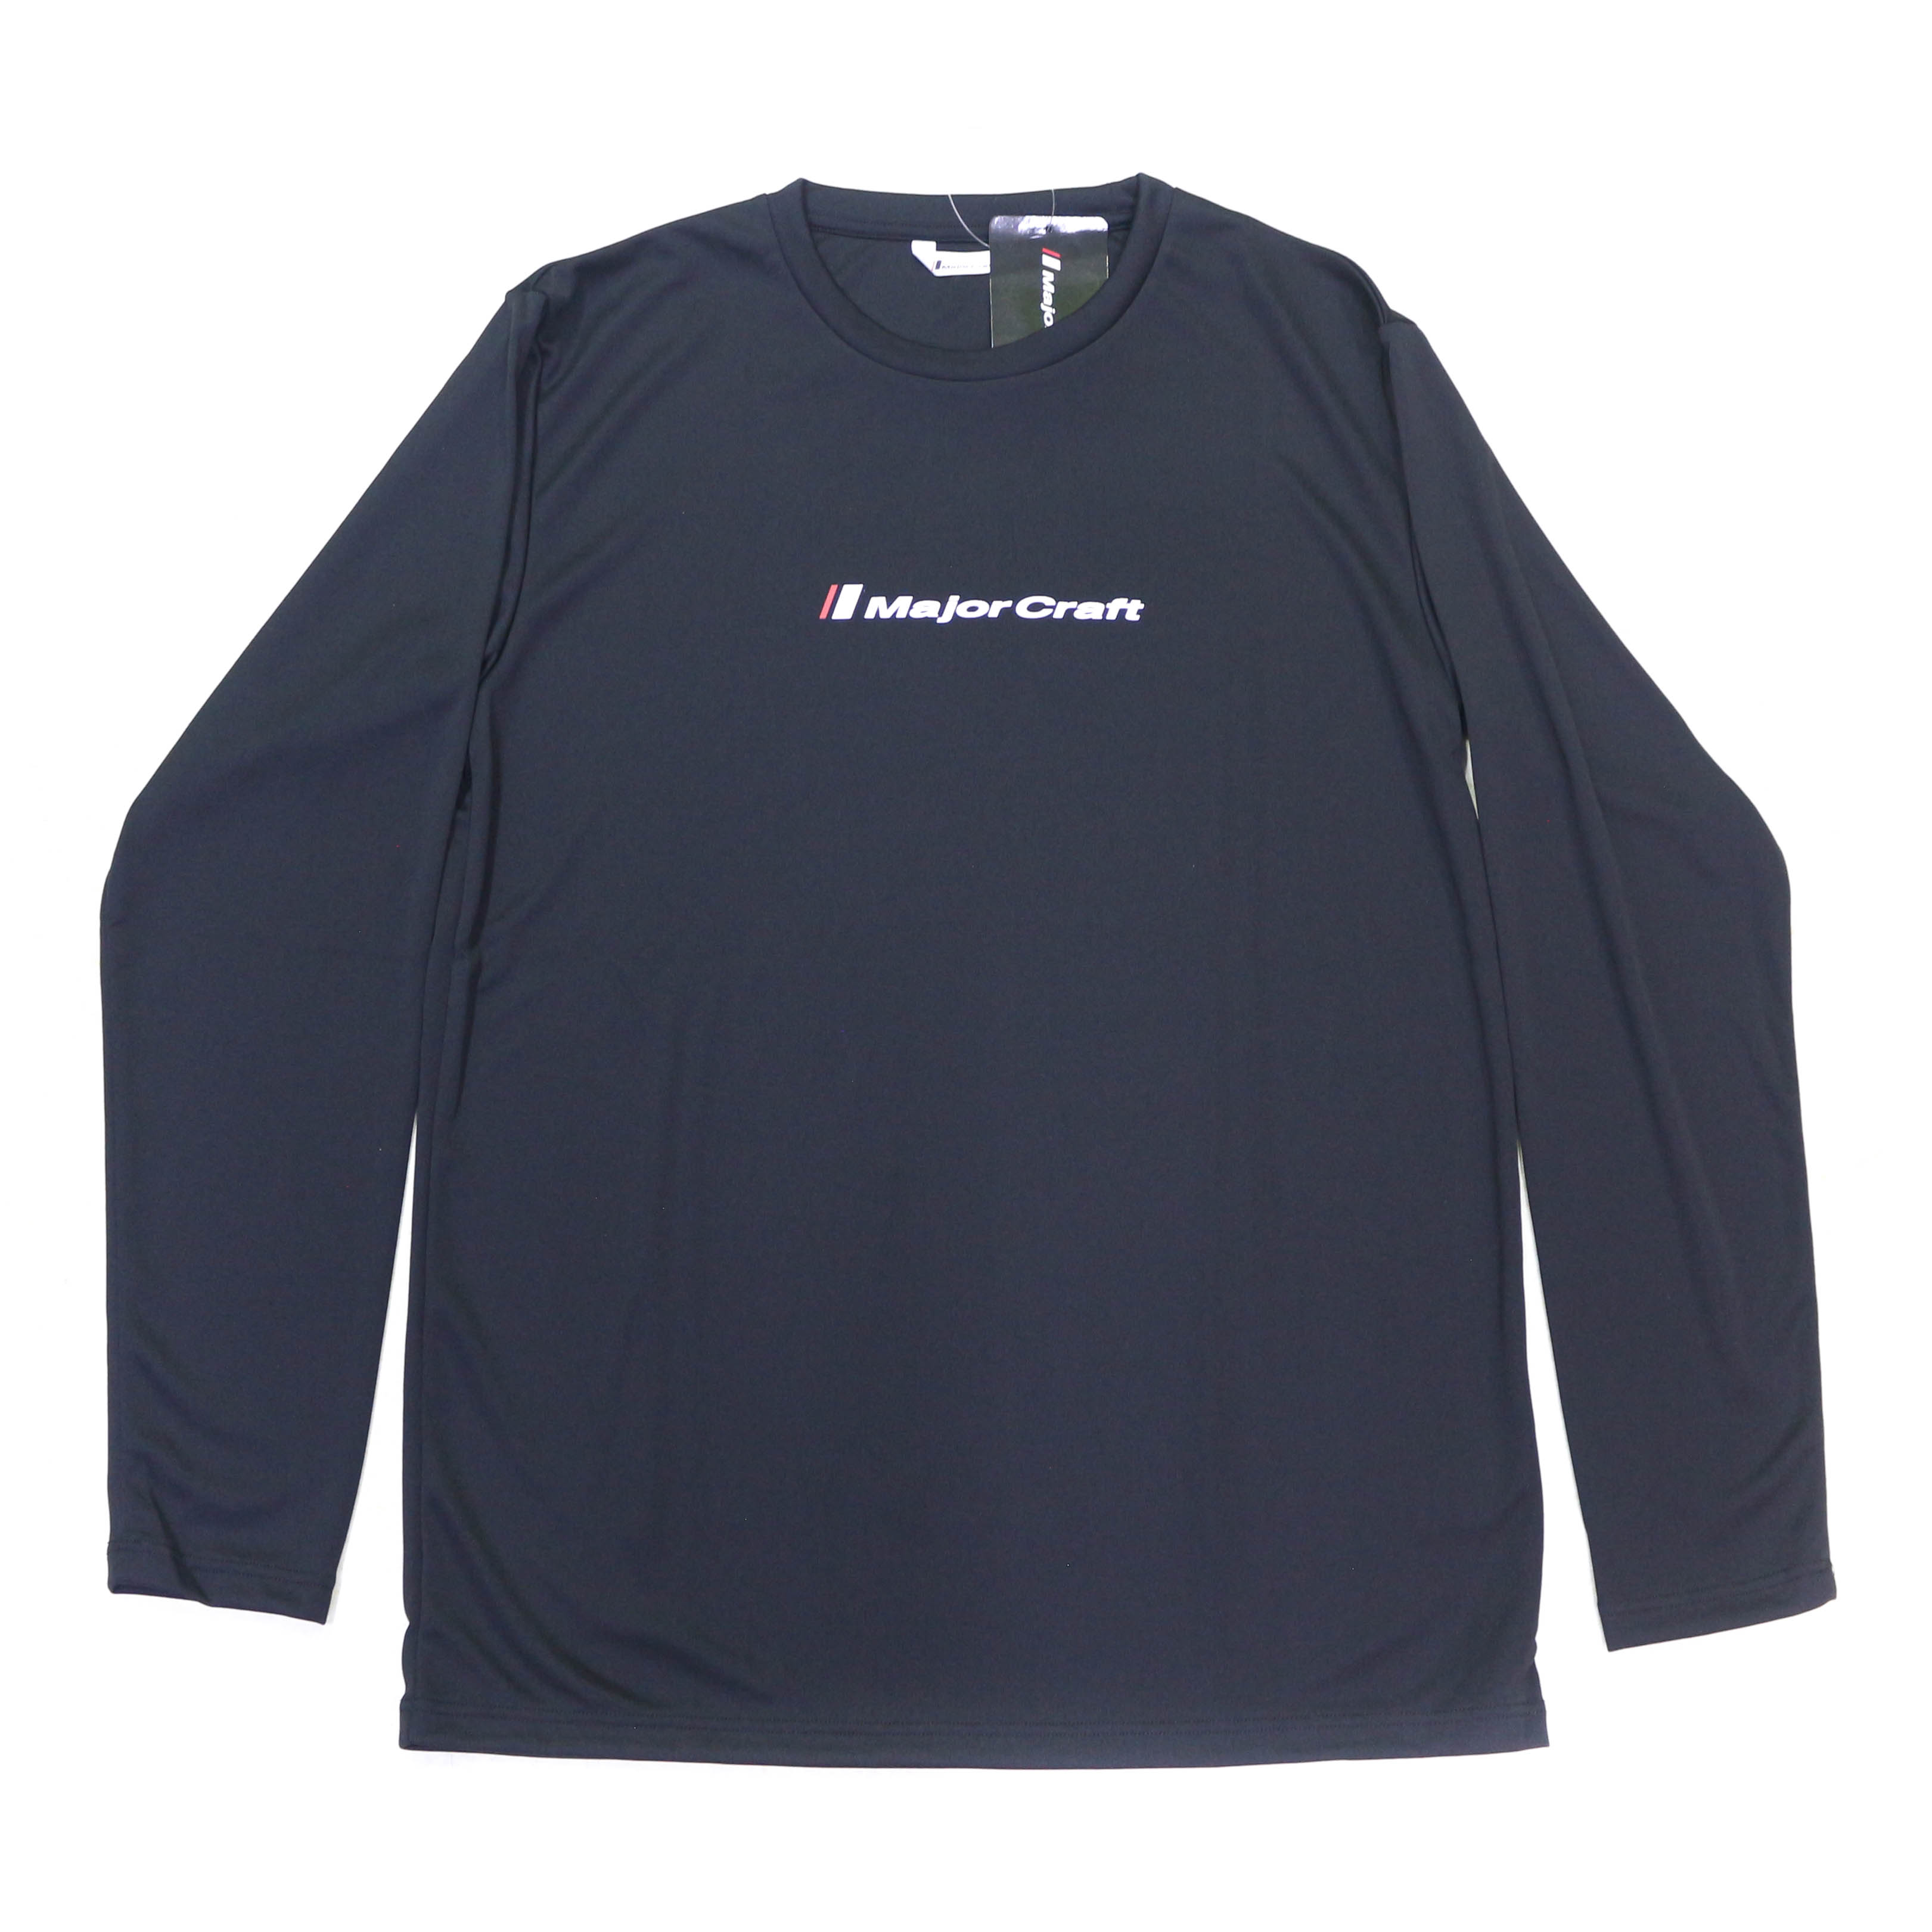 Major Craft T-Shirt Long Sleeve MCW-DLT-LL/BK (3154)